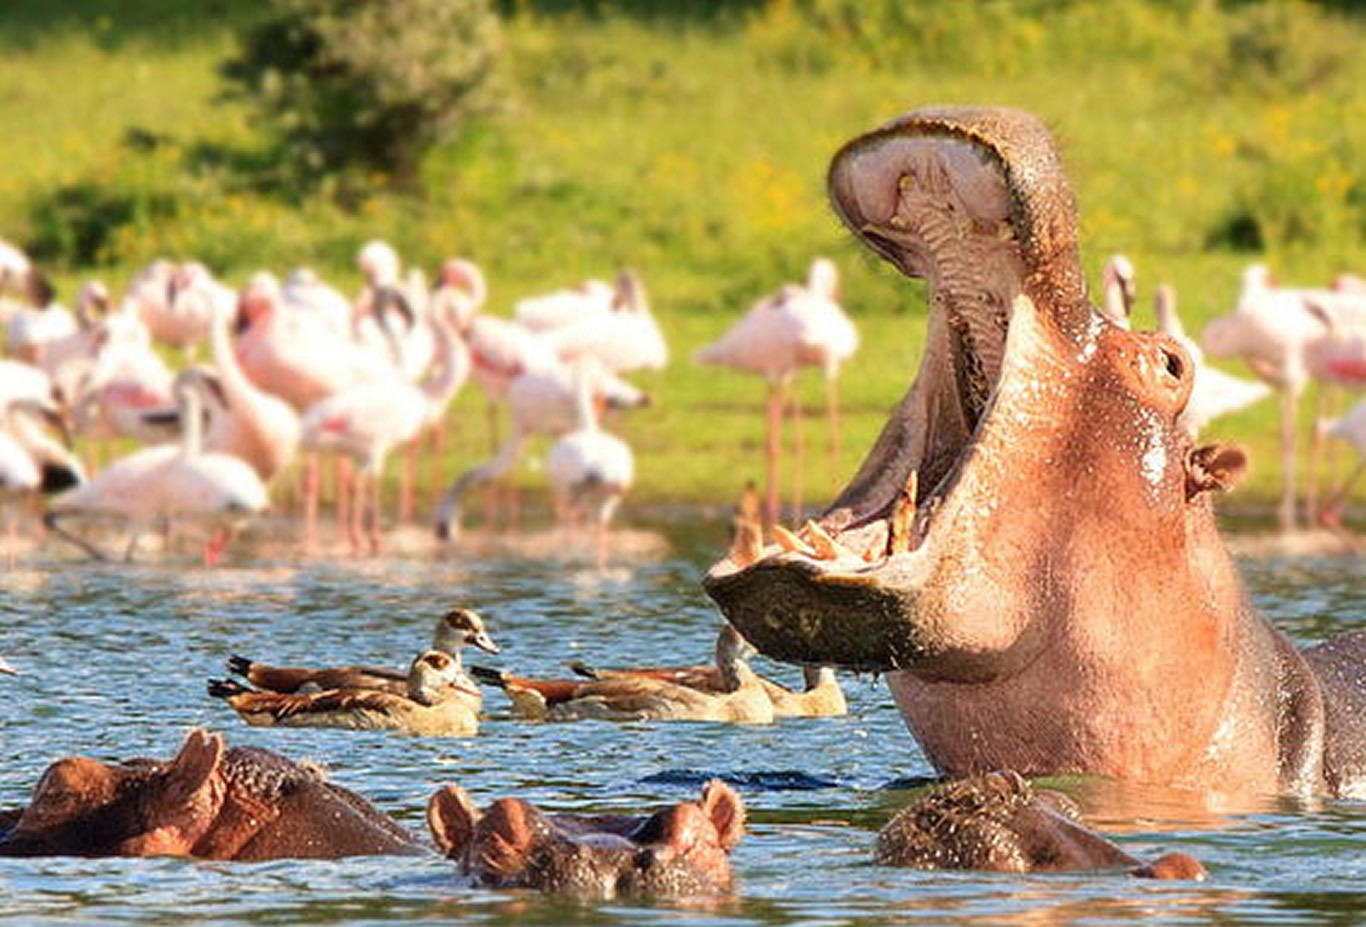 Hippos in their natural habitat in Selous